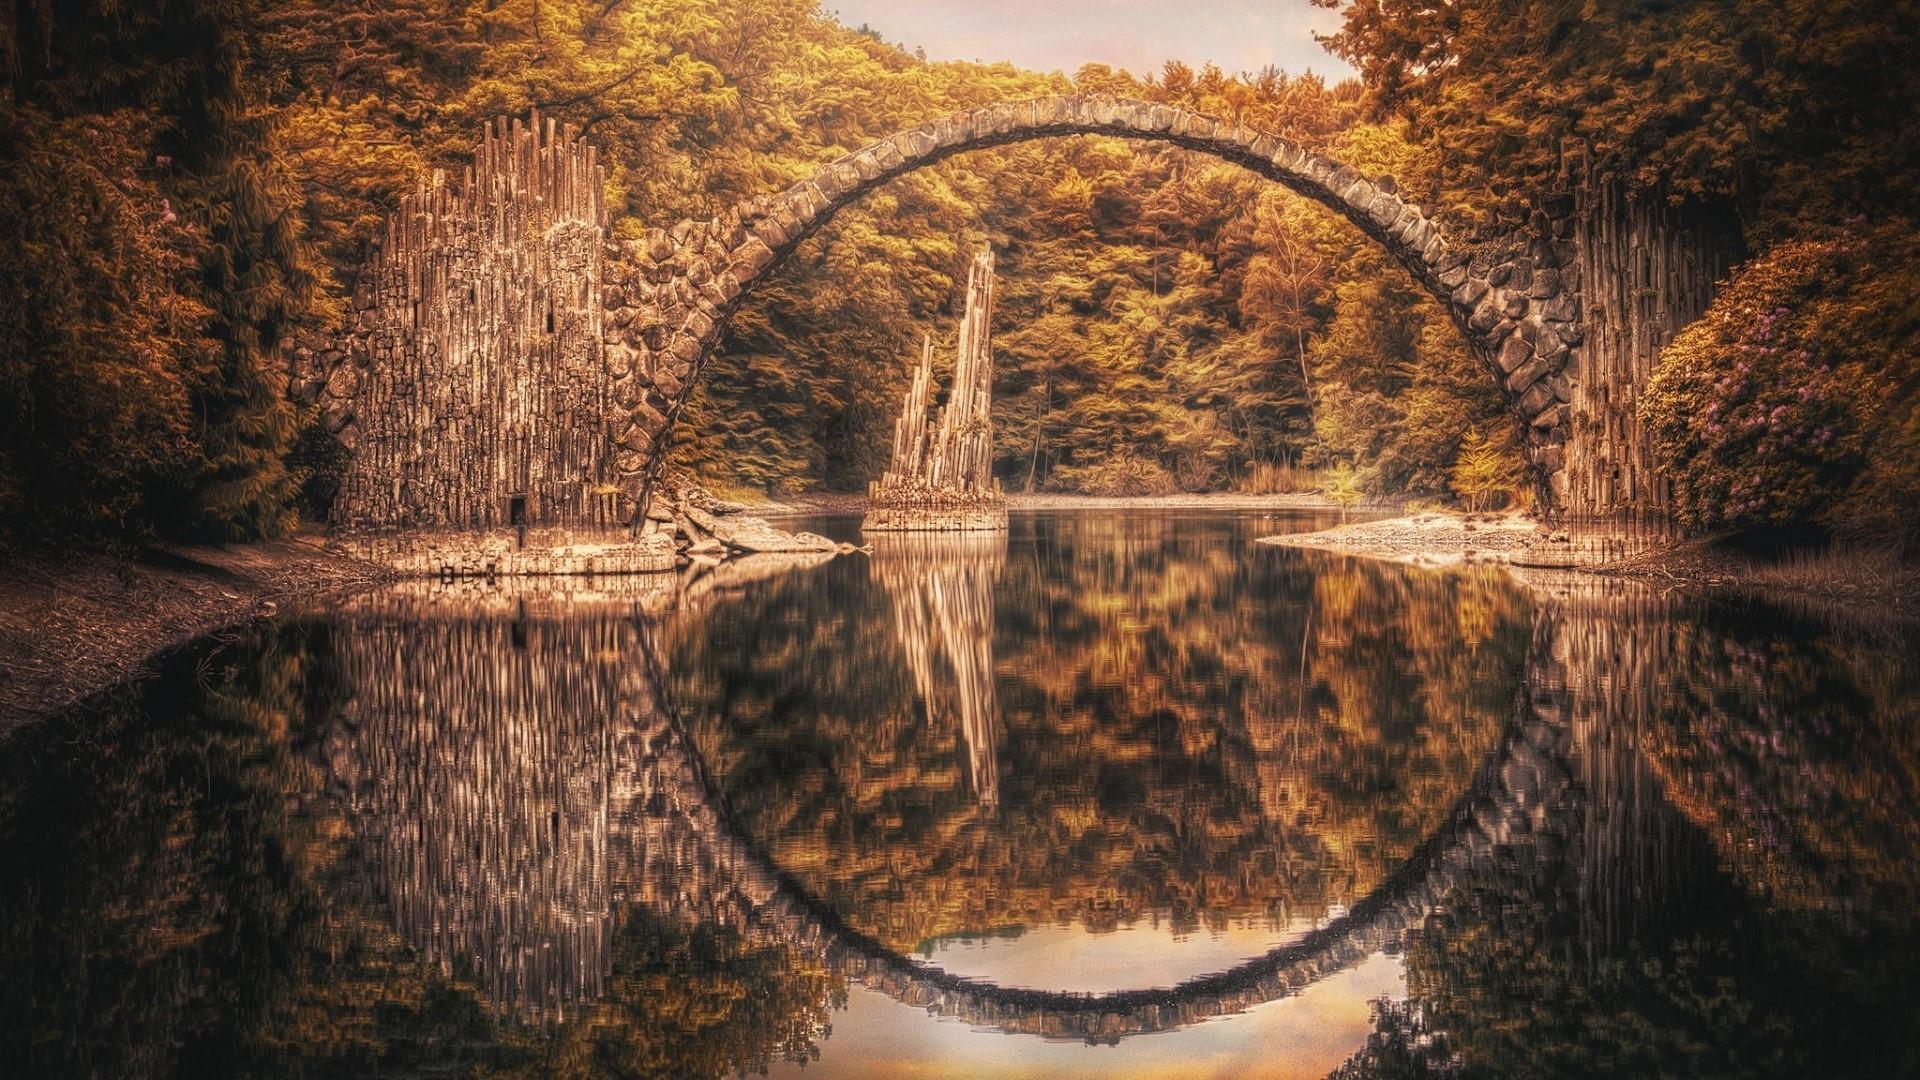 Gravity Falls Computer Wallpaper Wallpaper Trees Landscape Forest Fall Nature